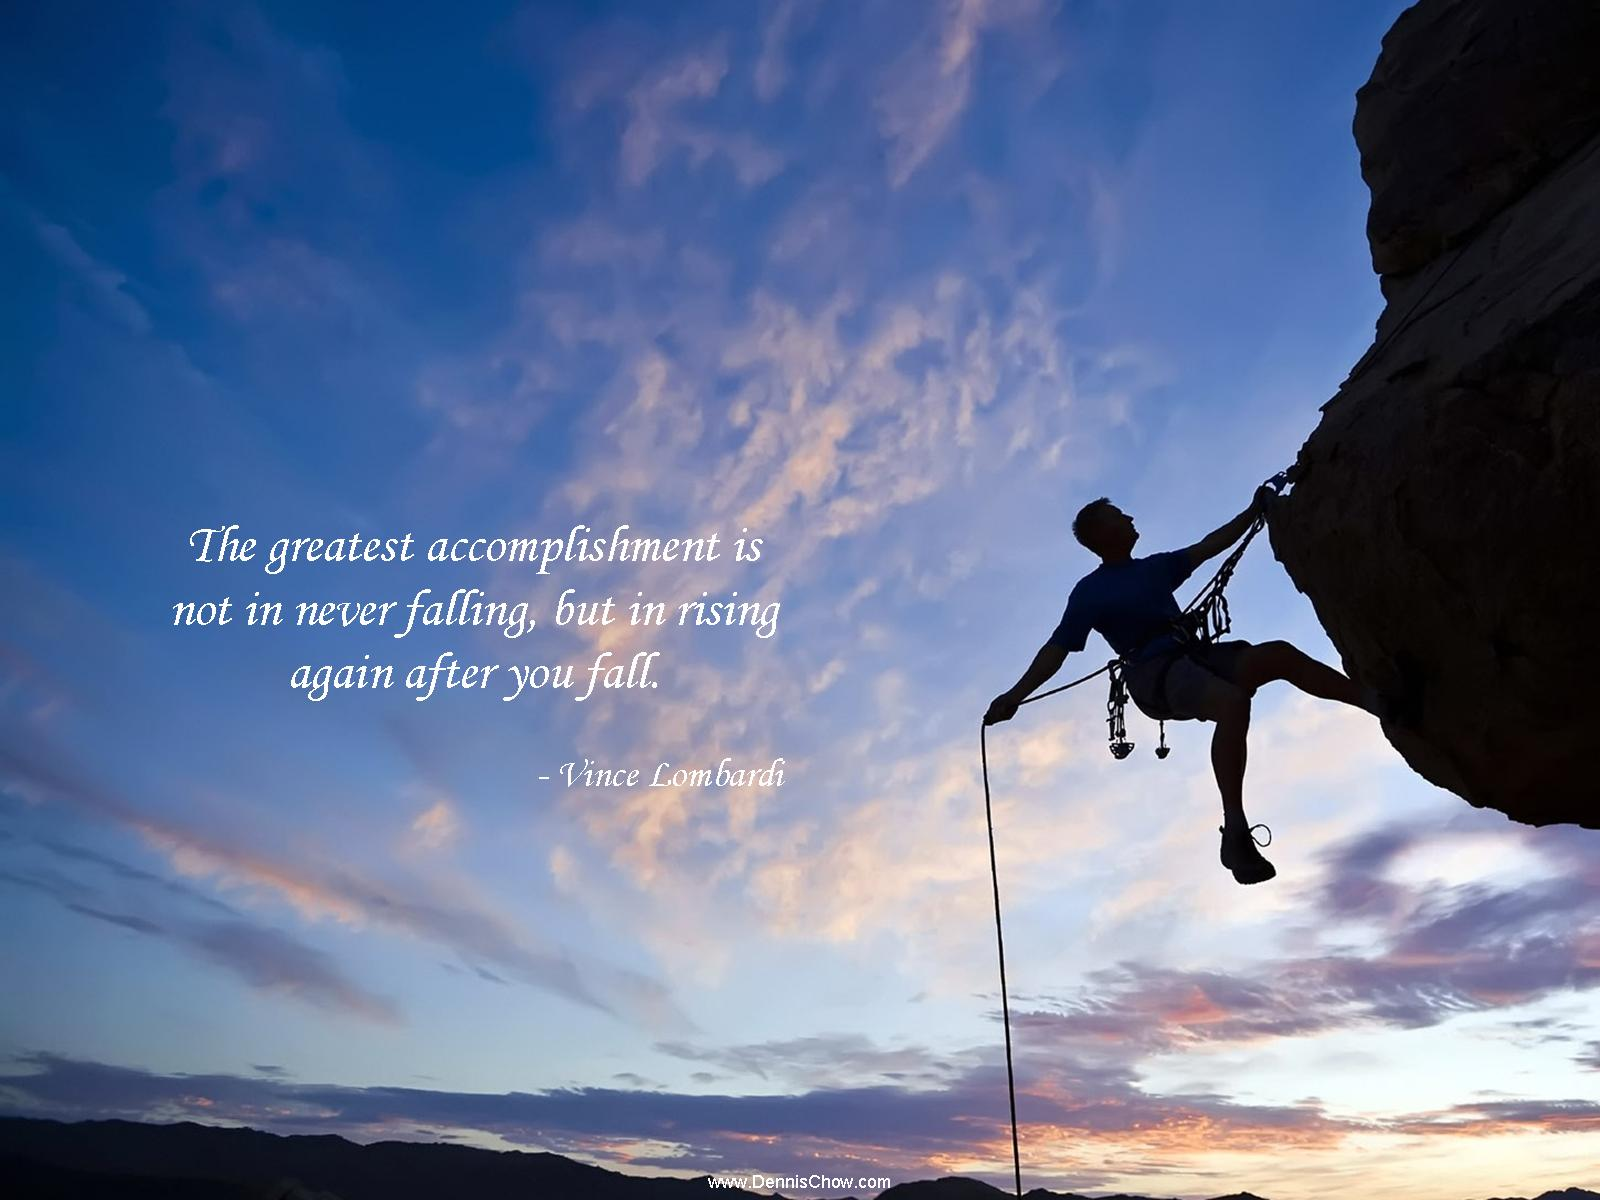 quotes wallpaper hd